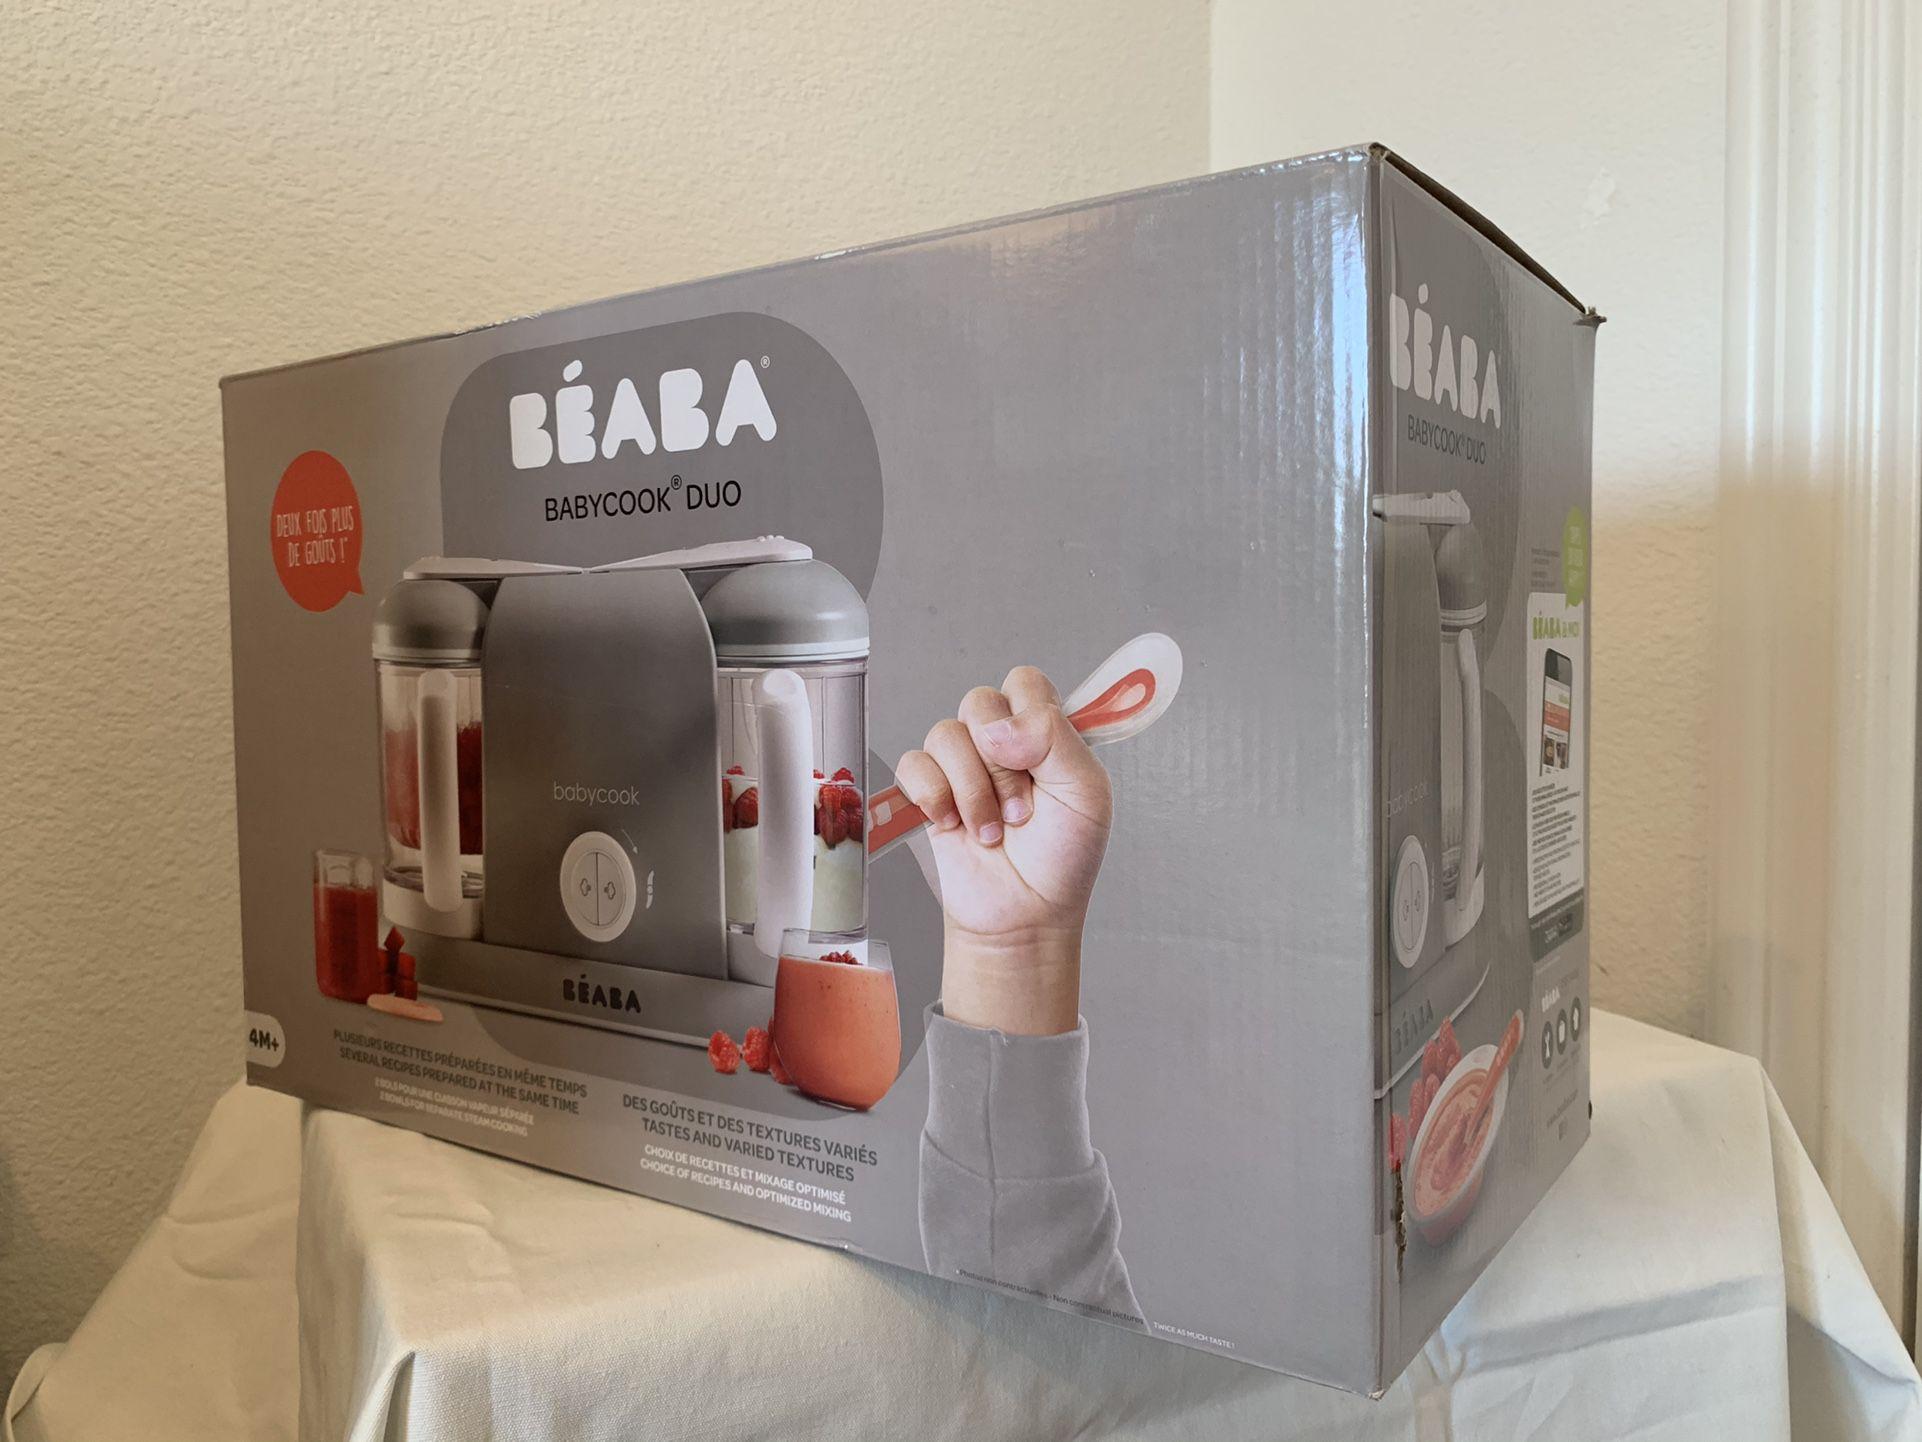 Beaba Babycook Duo Baby Food Maker